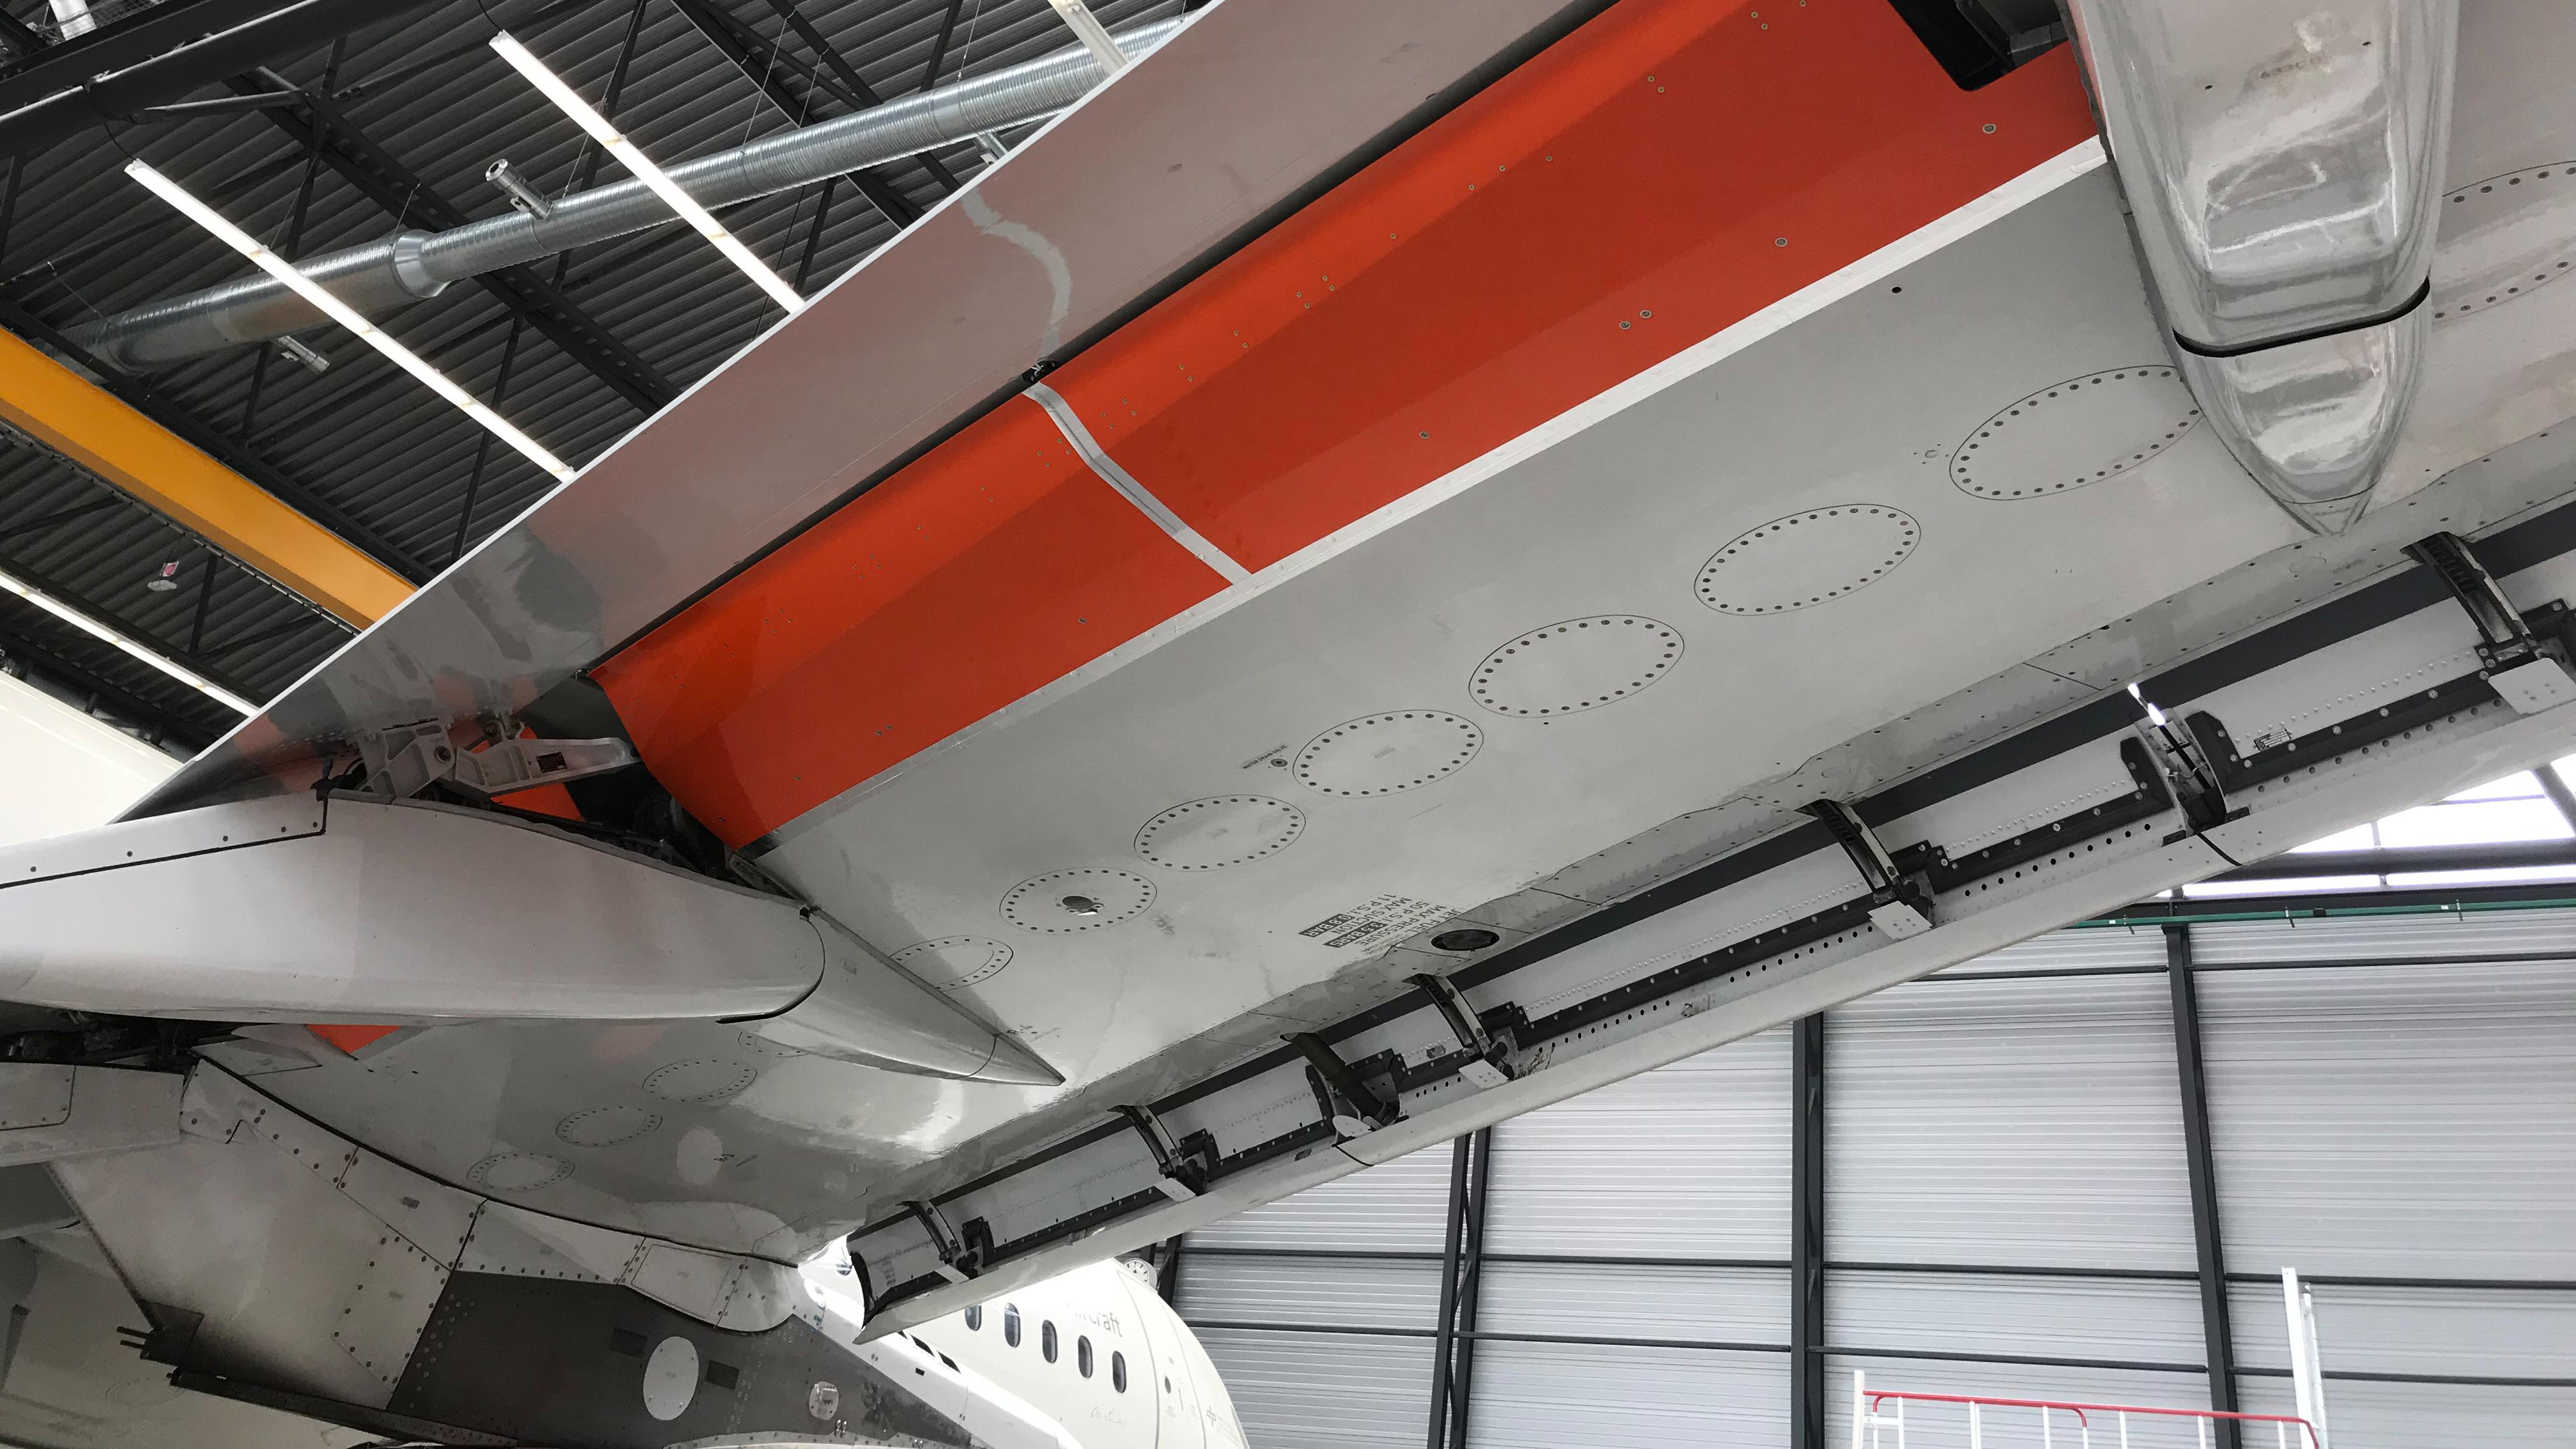 DLR A320 wing mod